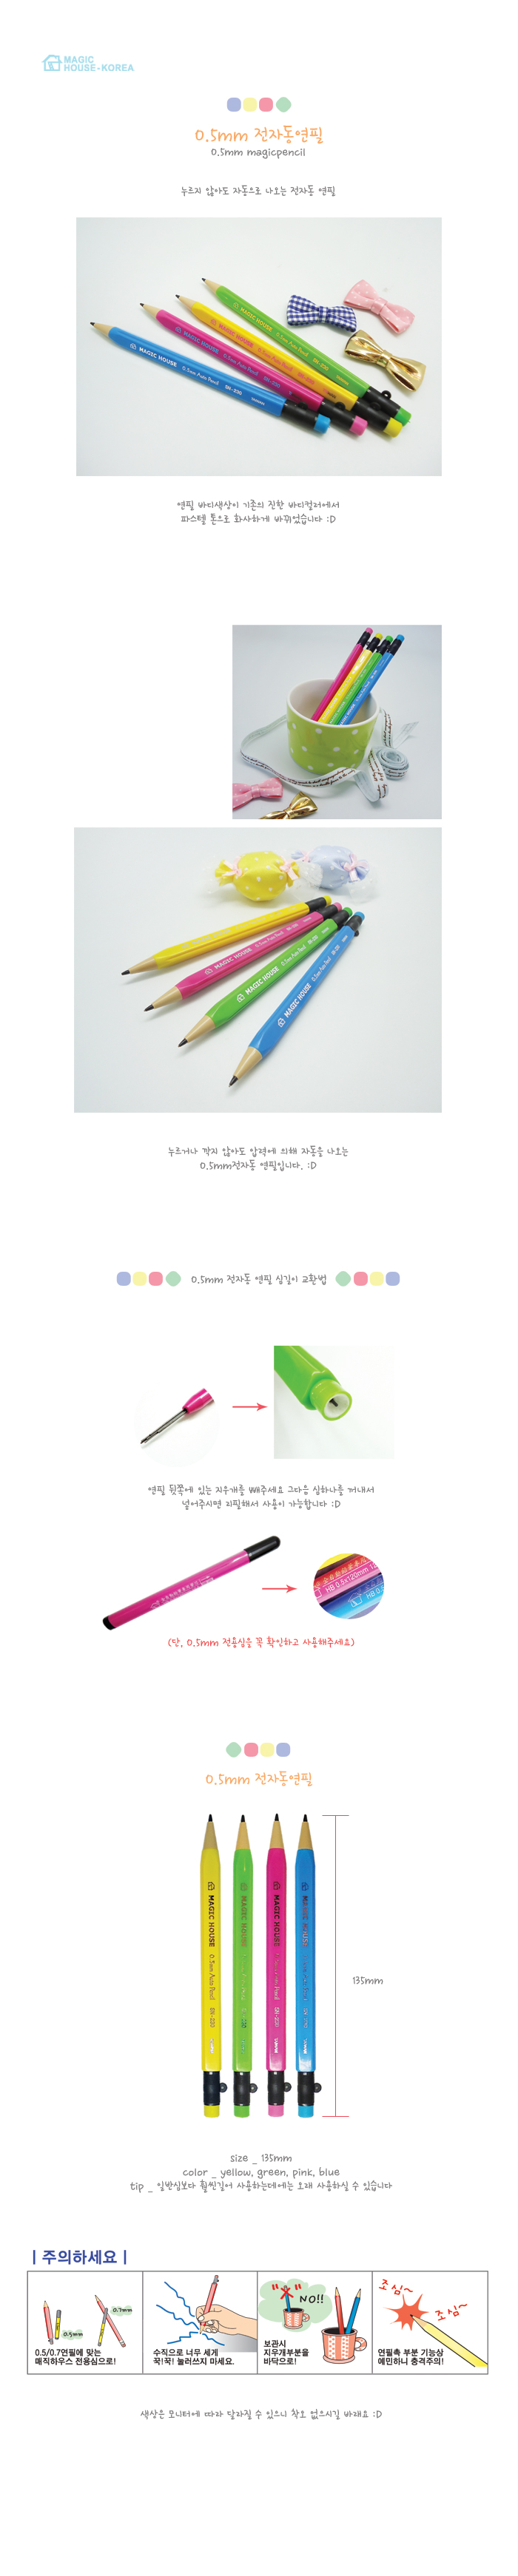 0.5mm 전자동연필-파스텔color - 매직하우스, 1,800원, 연필, 자동/기능성연필